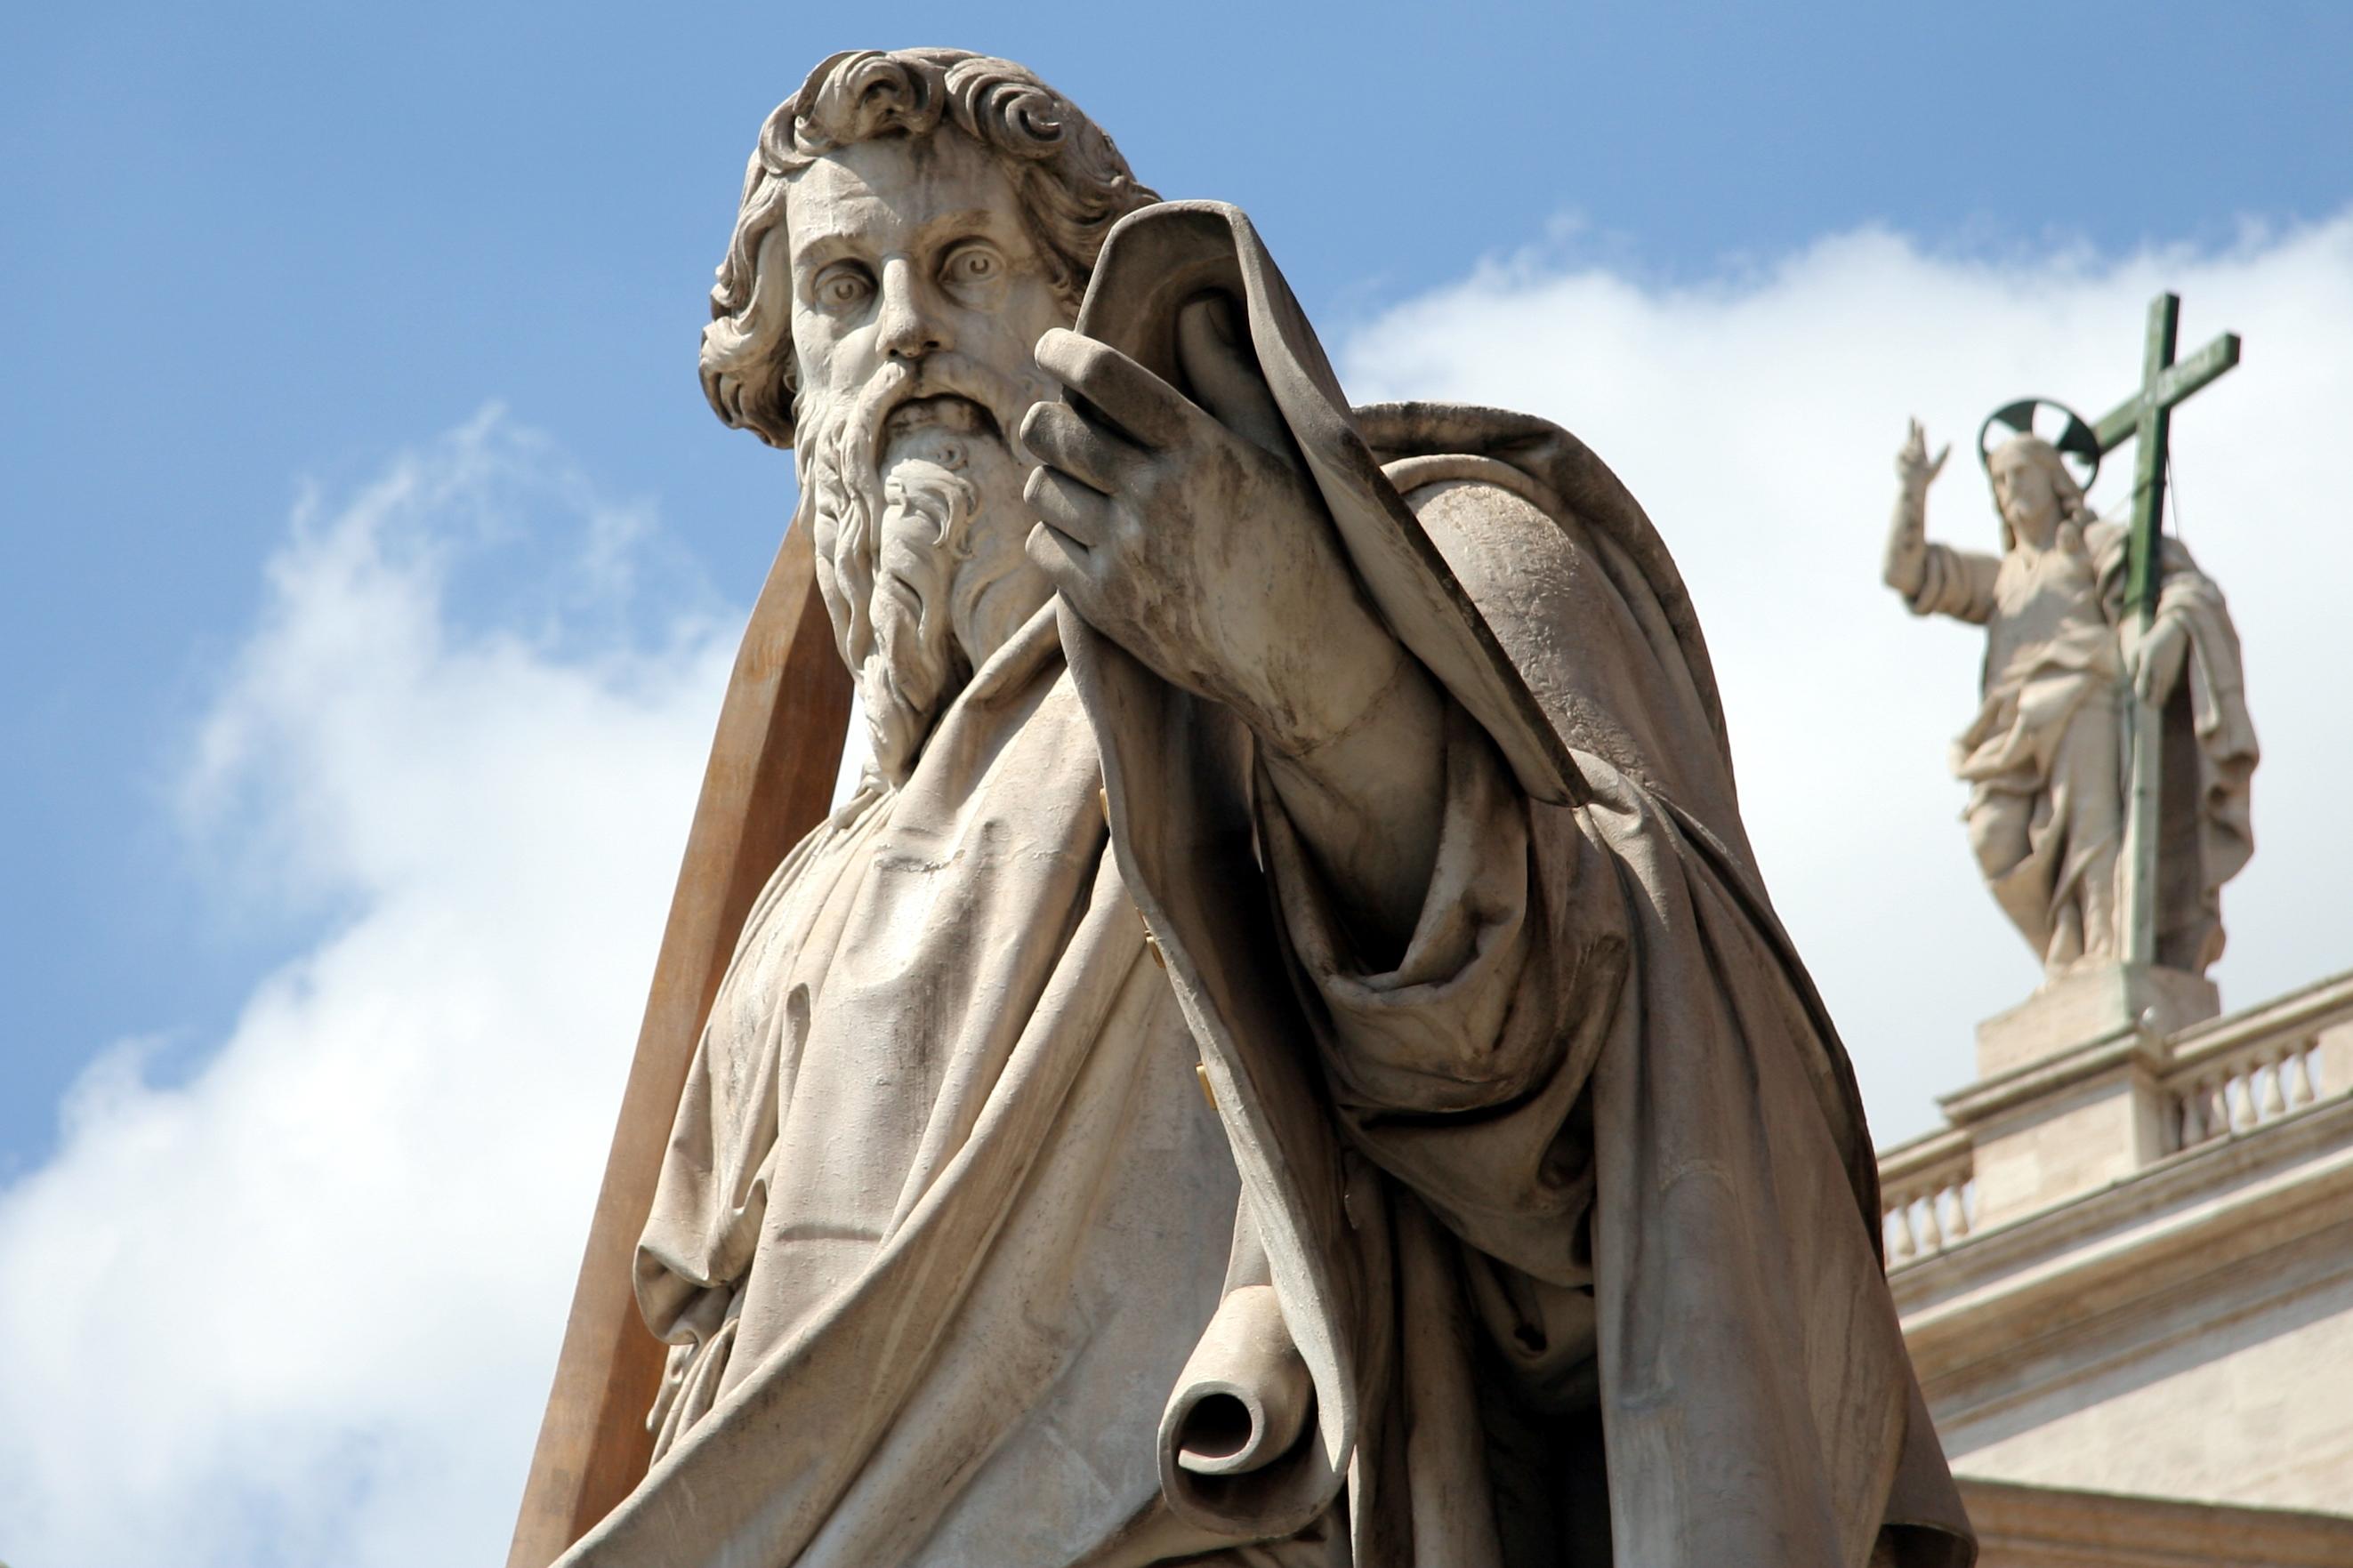 http://fr.academic.ru/pictures/frwiki/86/Vatican_StPaul_Statue.jpg